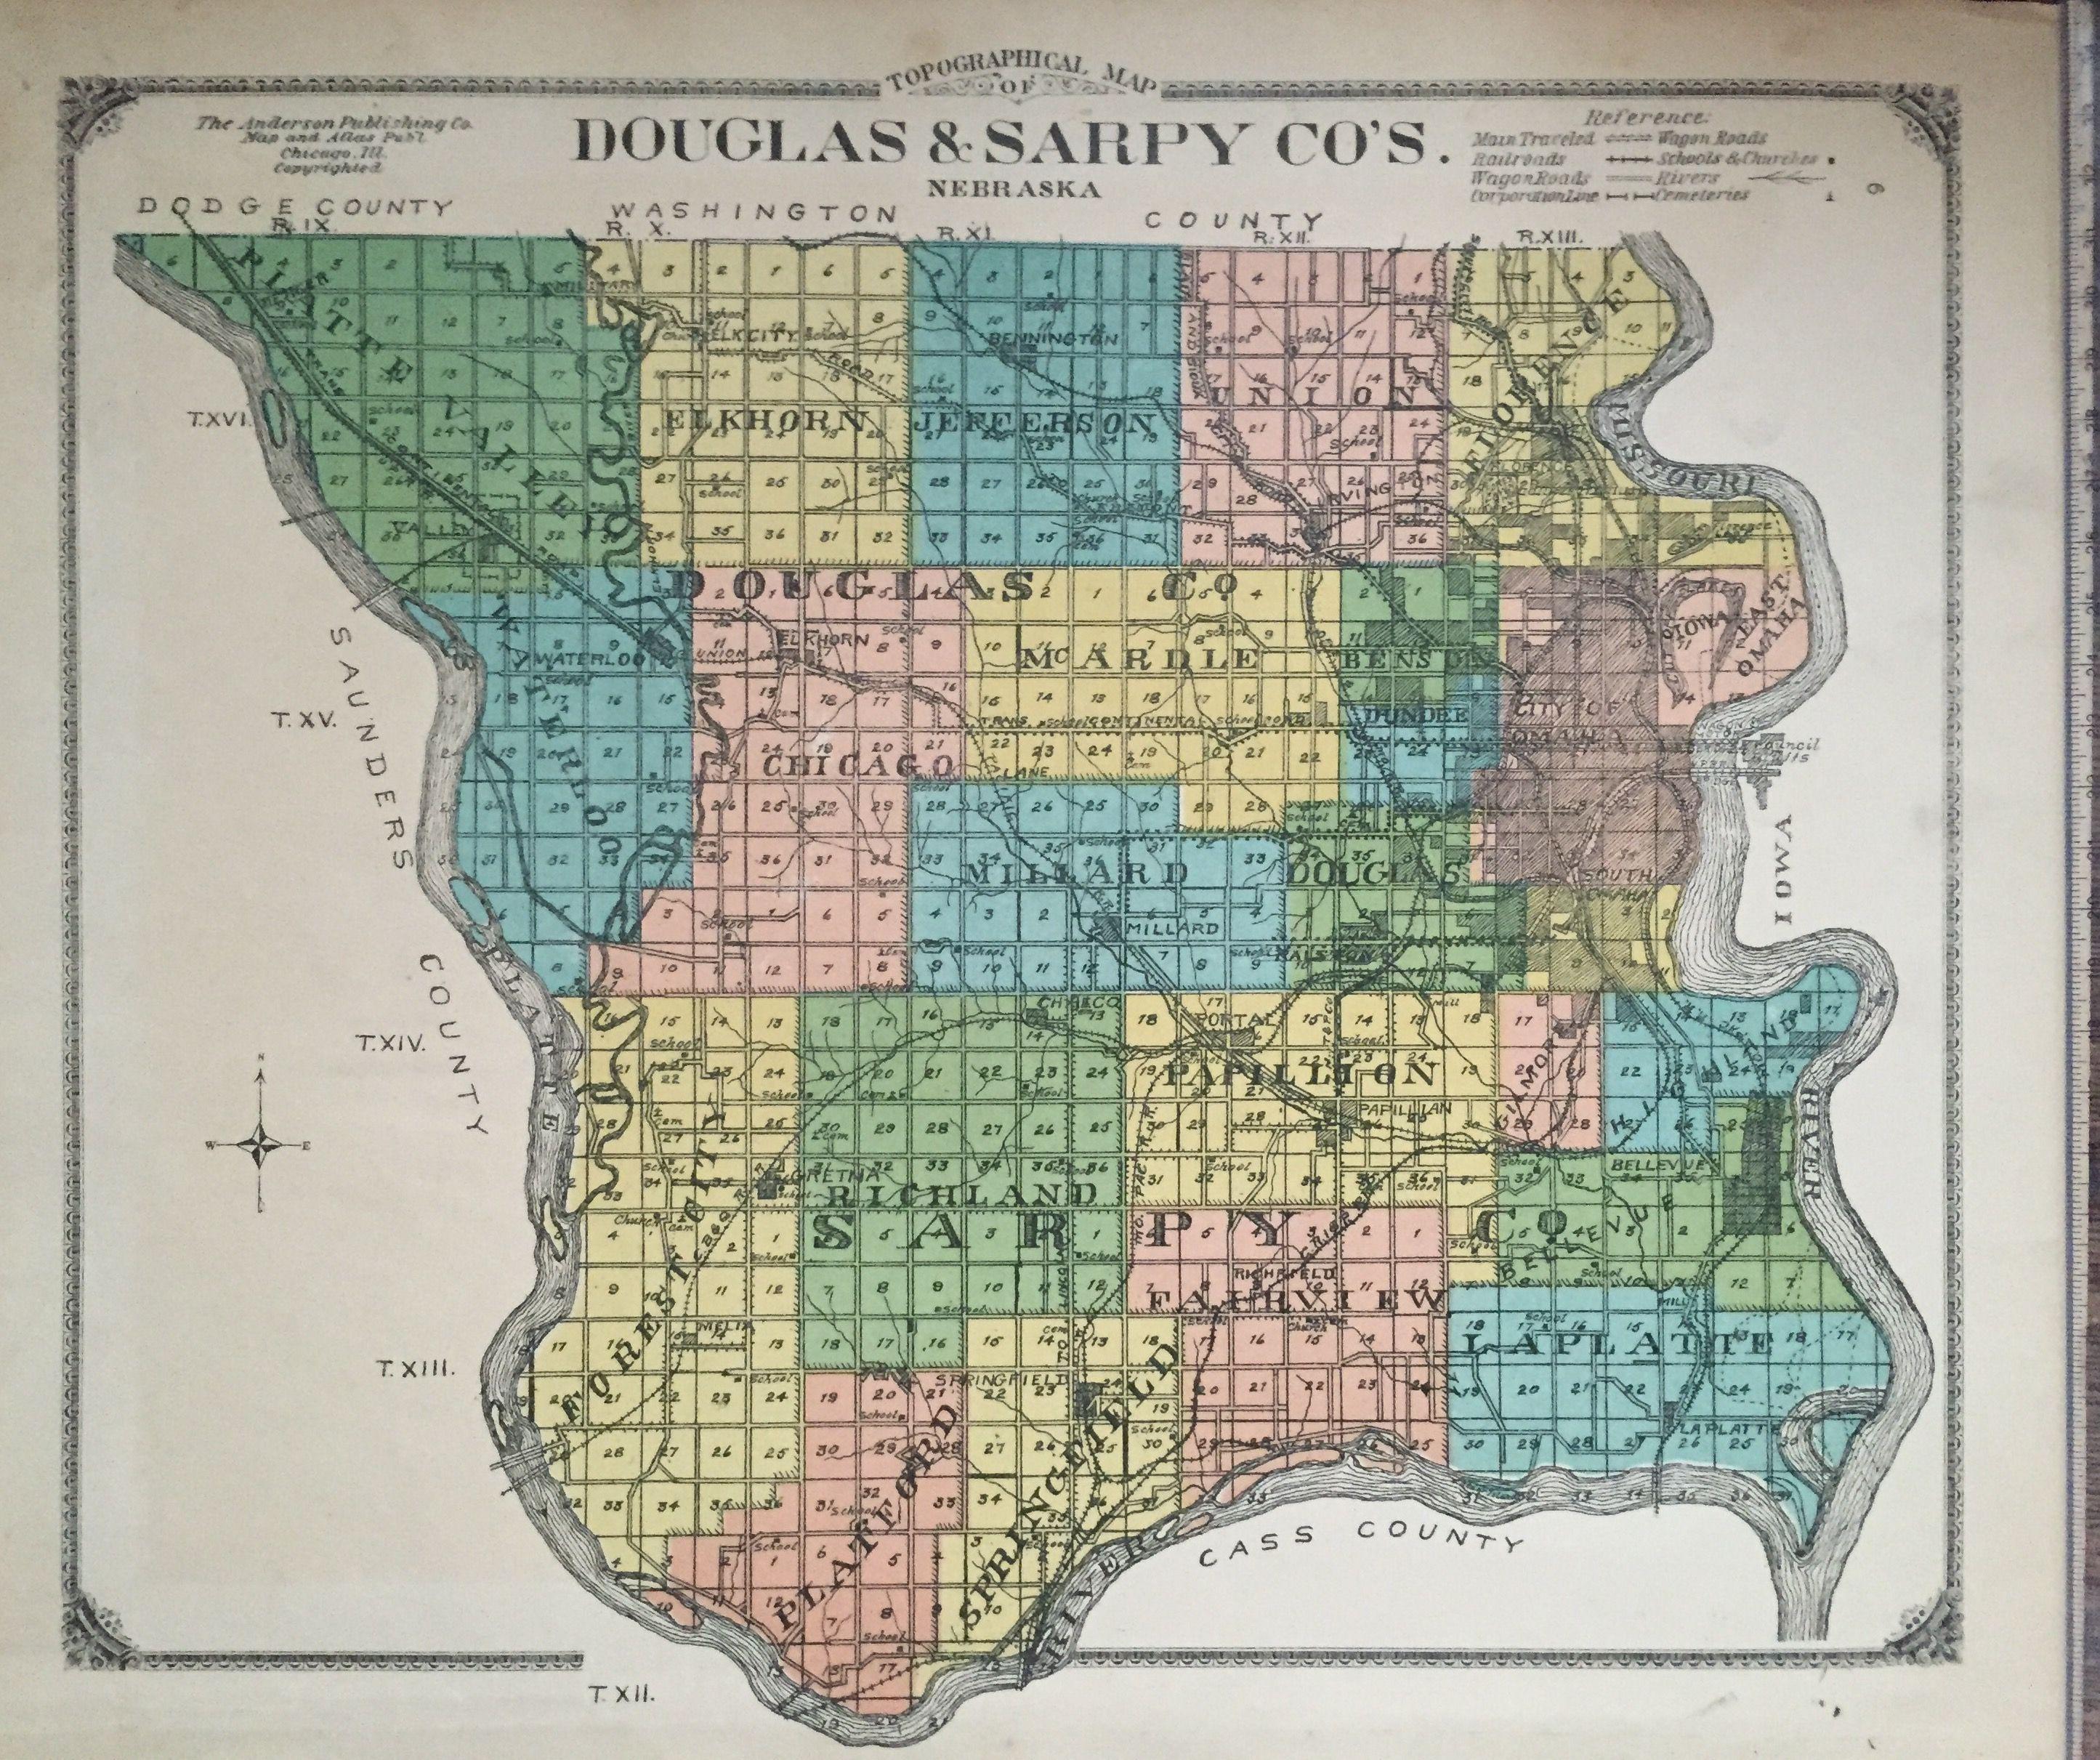 Counties Nebraska Map.Douglas And Sarpy Counties Nebraska 1910s Atlas Antique Maps